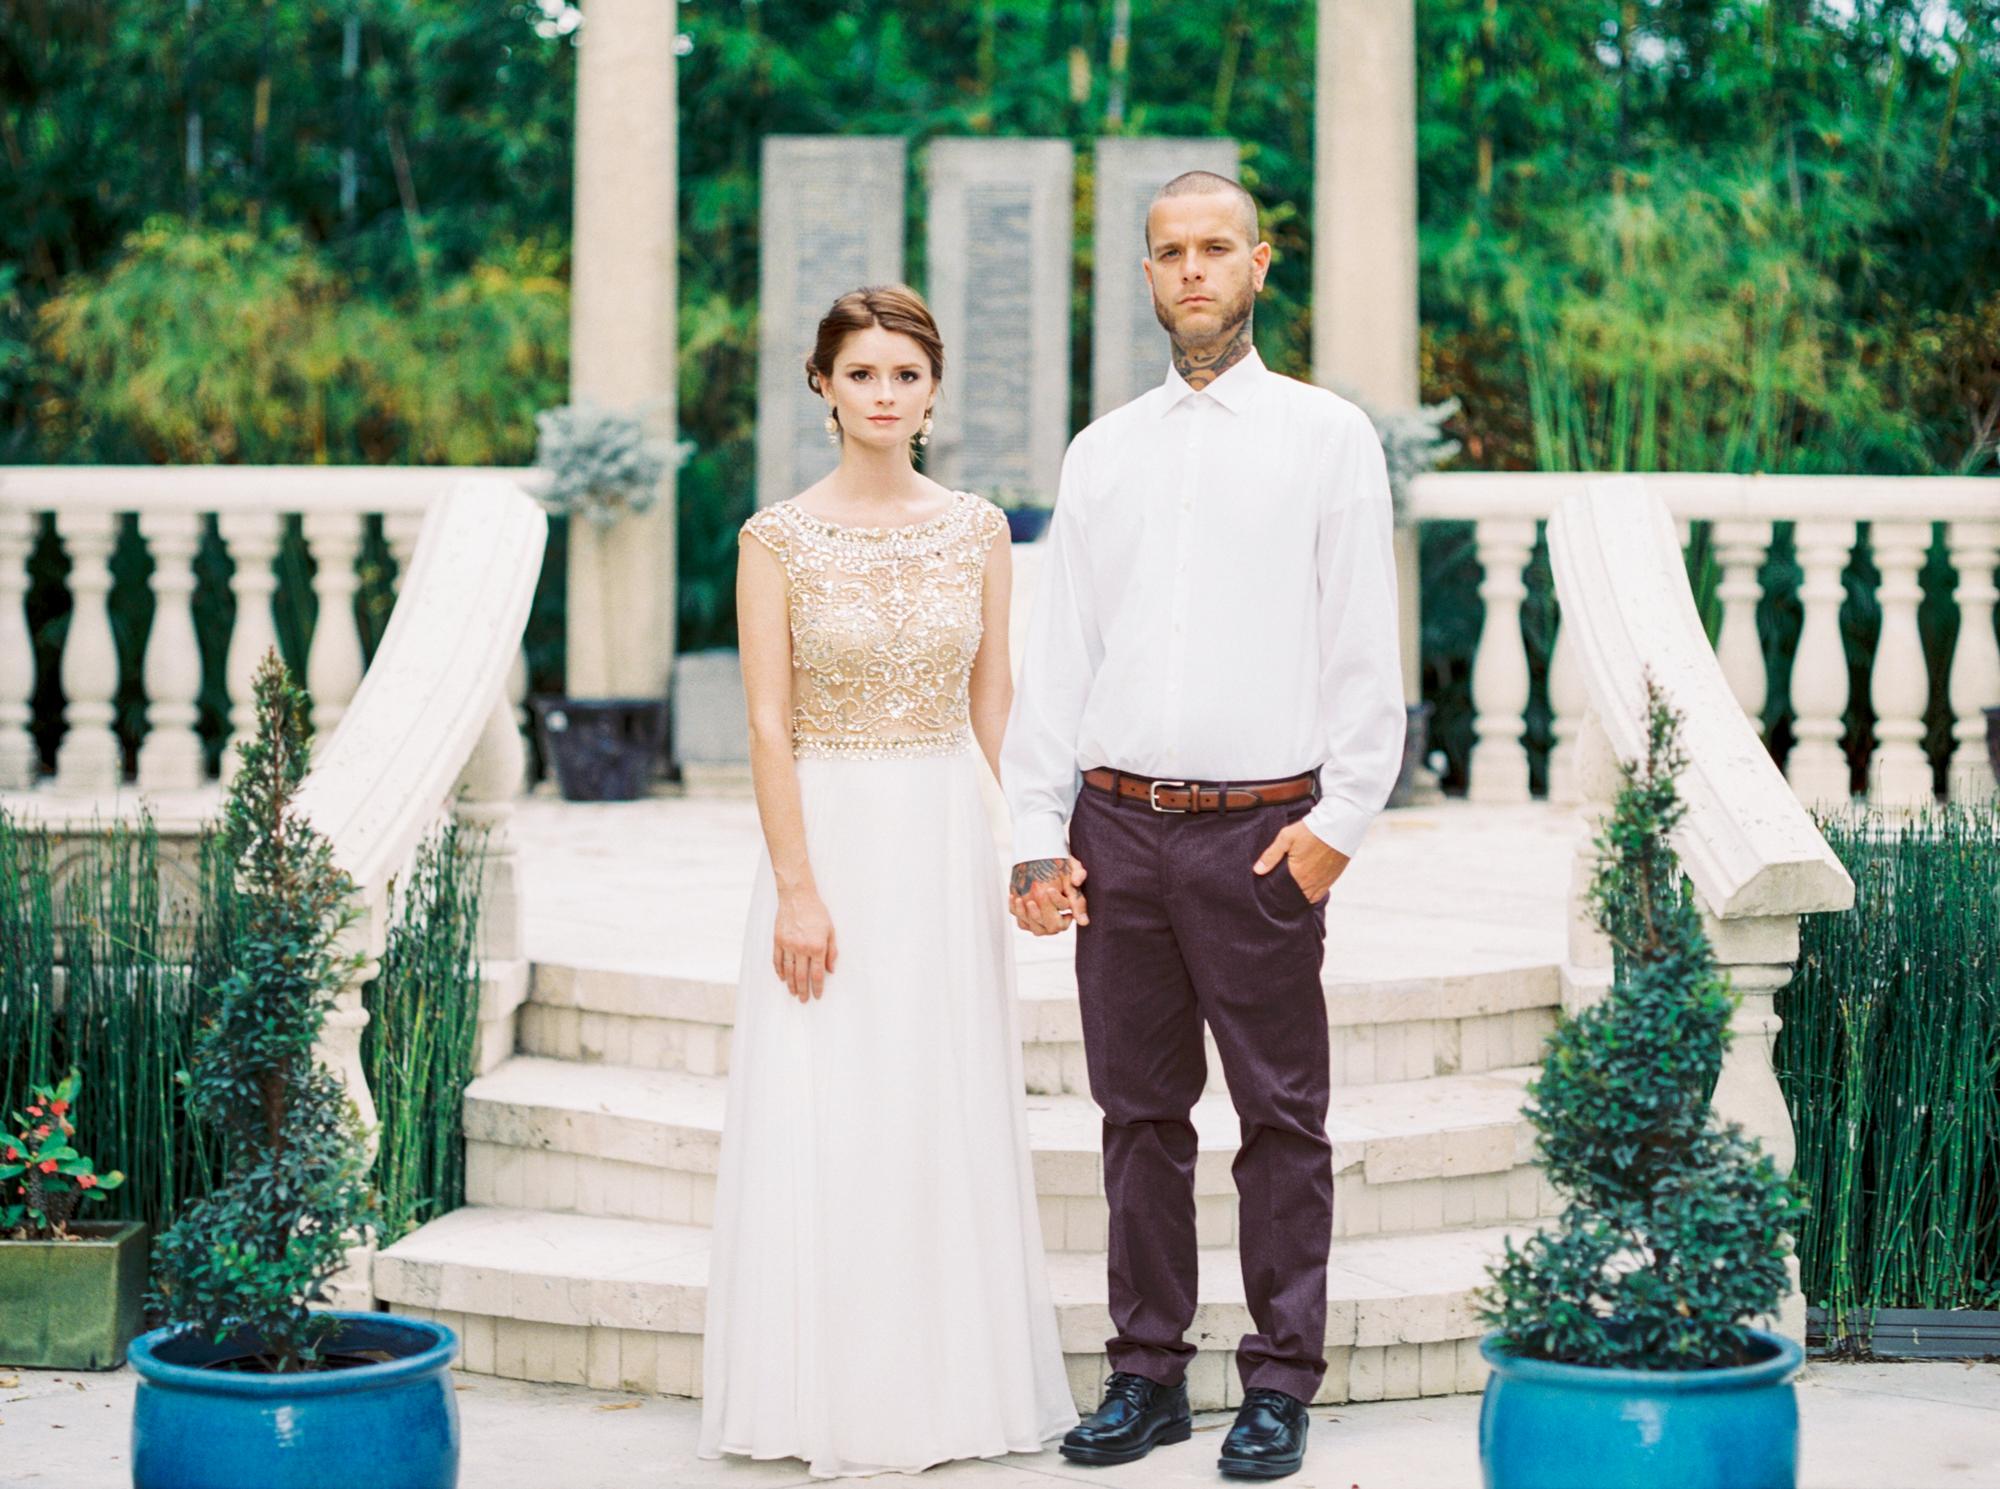 valkaria gardens palm bay FL bride and groom ceremony wedding photos